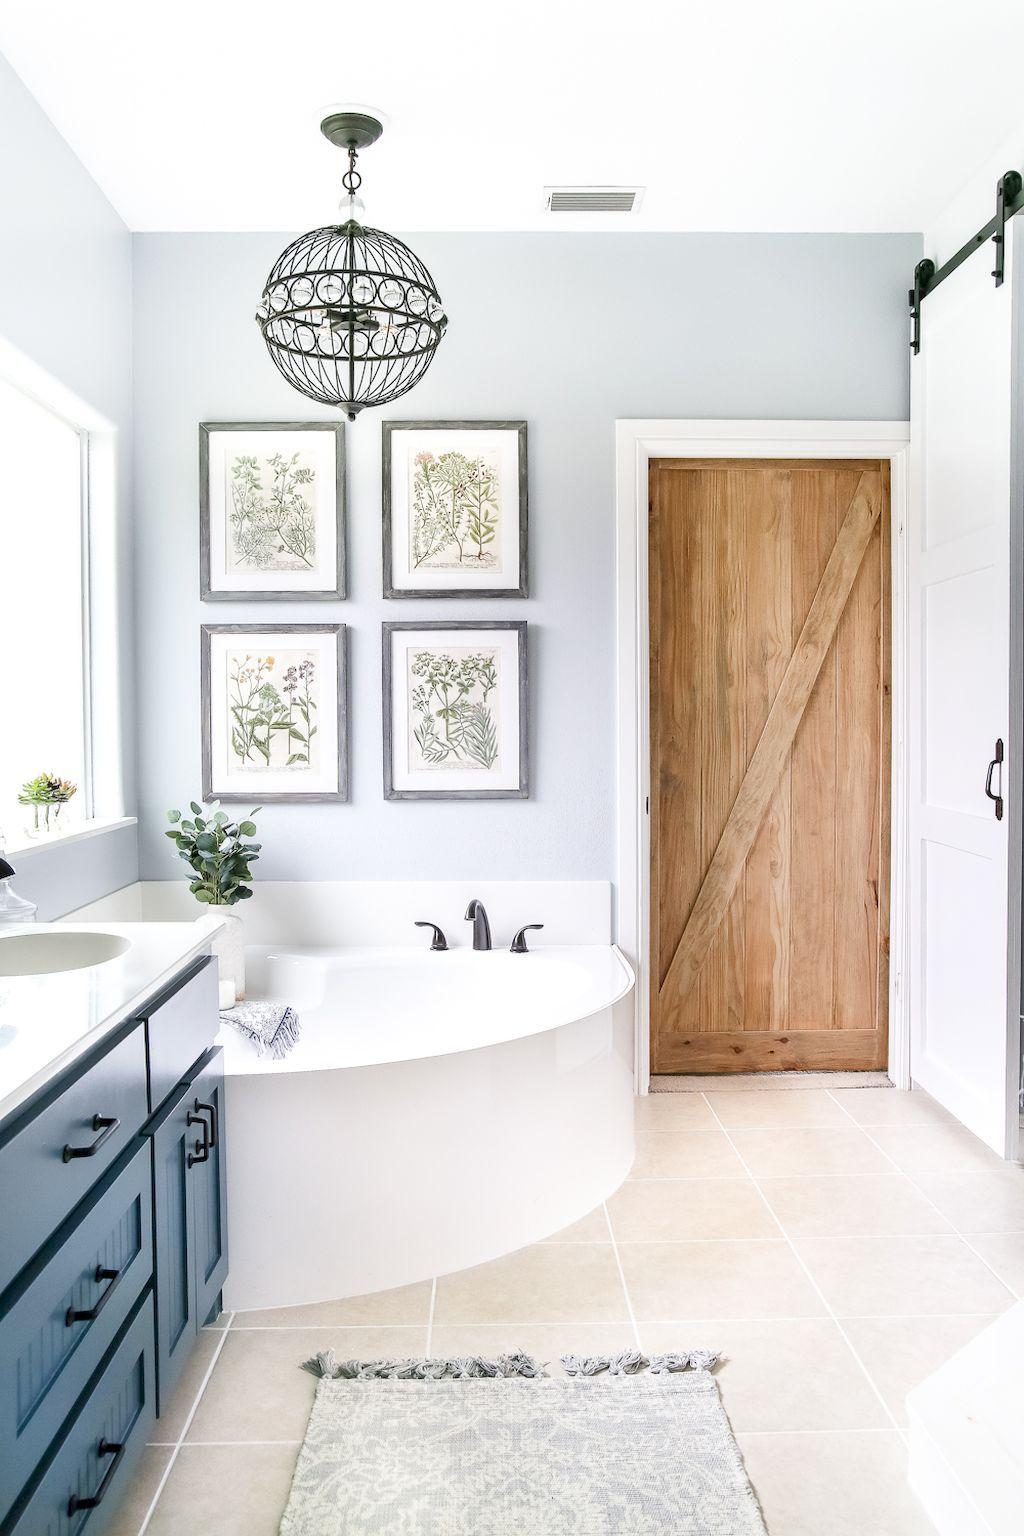 80 Beautiful Master Bathroom Remodel Ideas | Master bathrooms ...